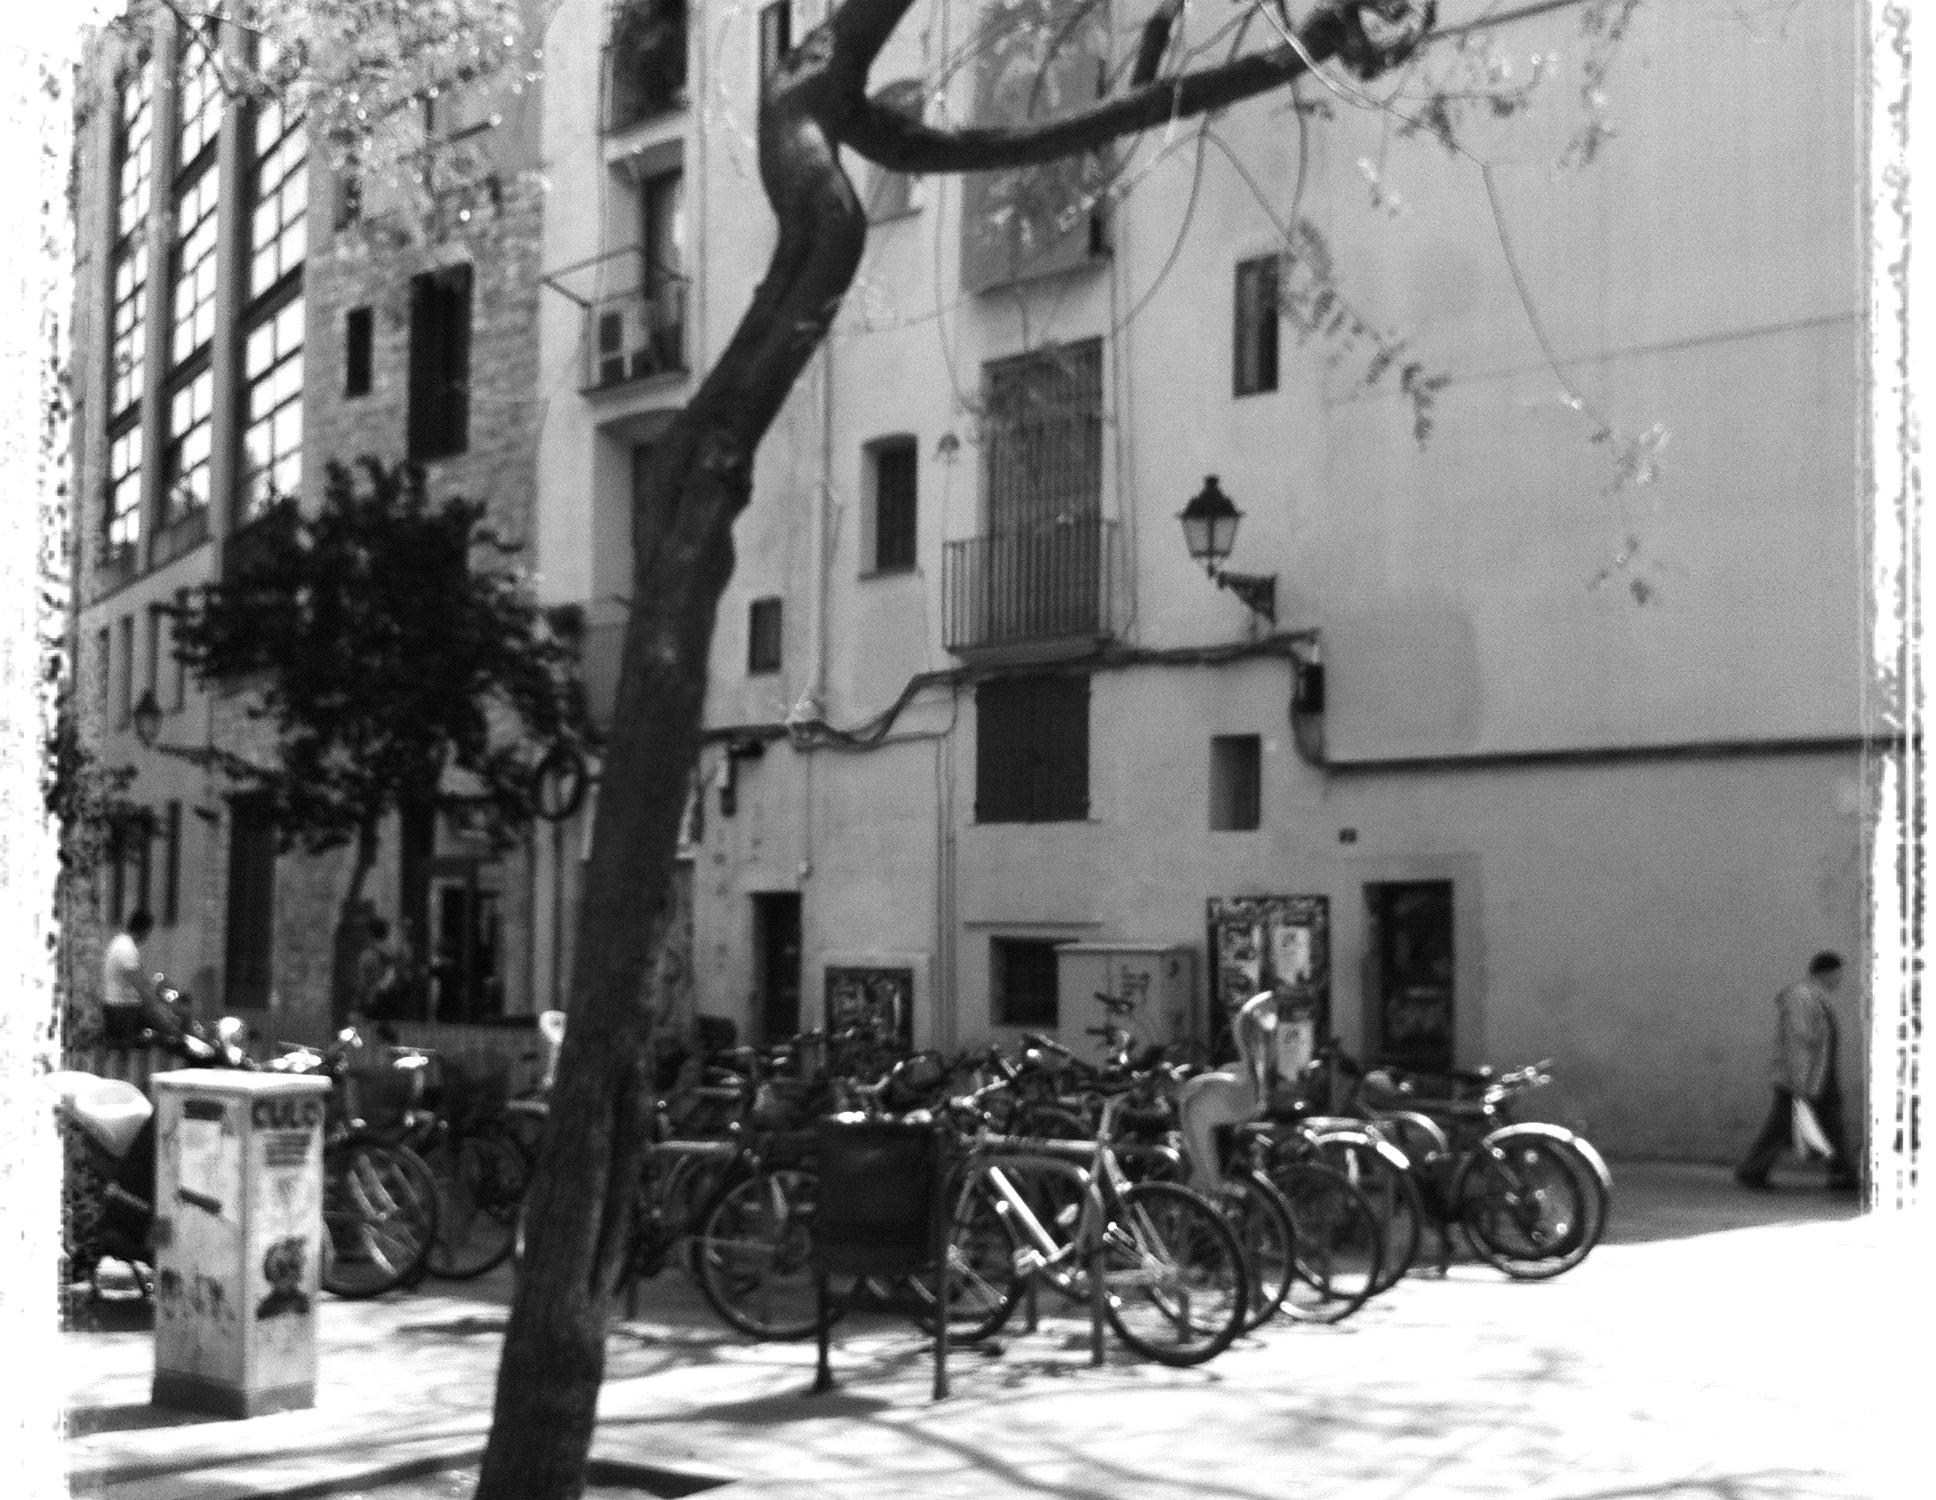 Sunny sunday in Raval, Barcelona